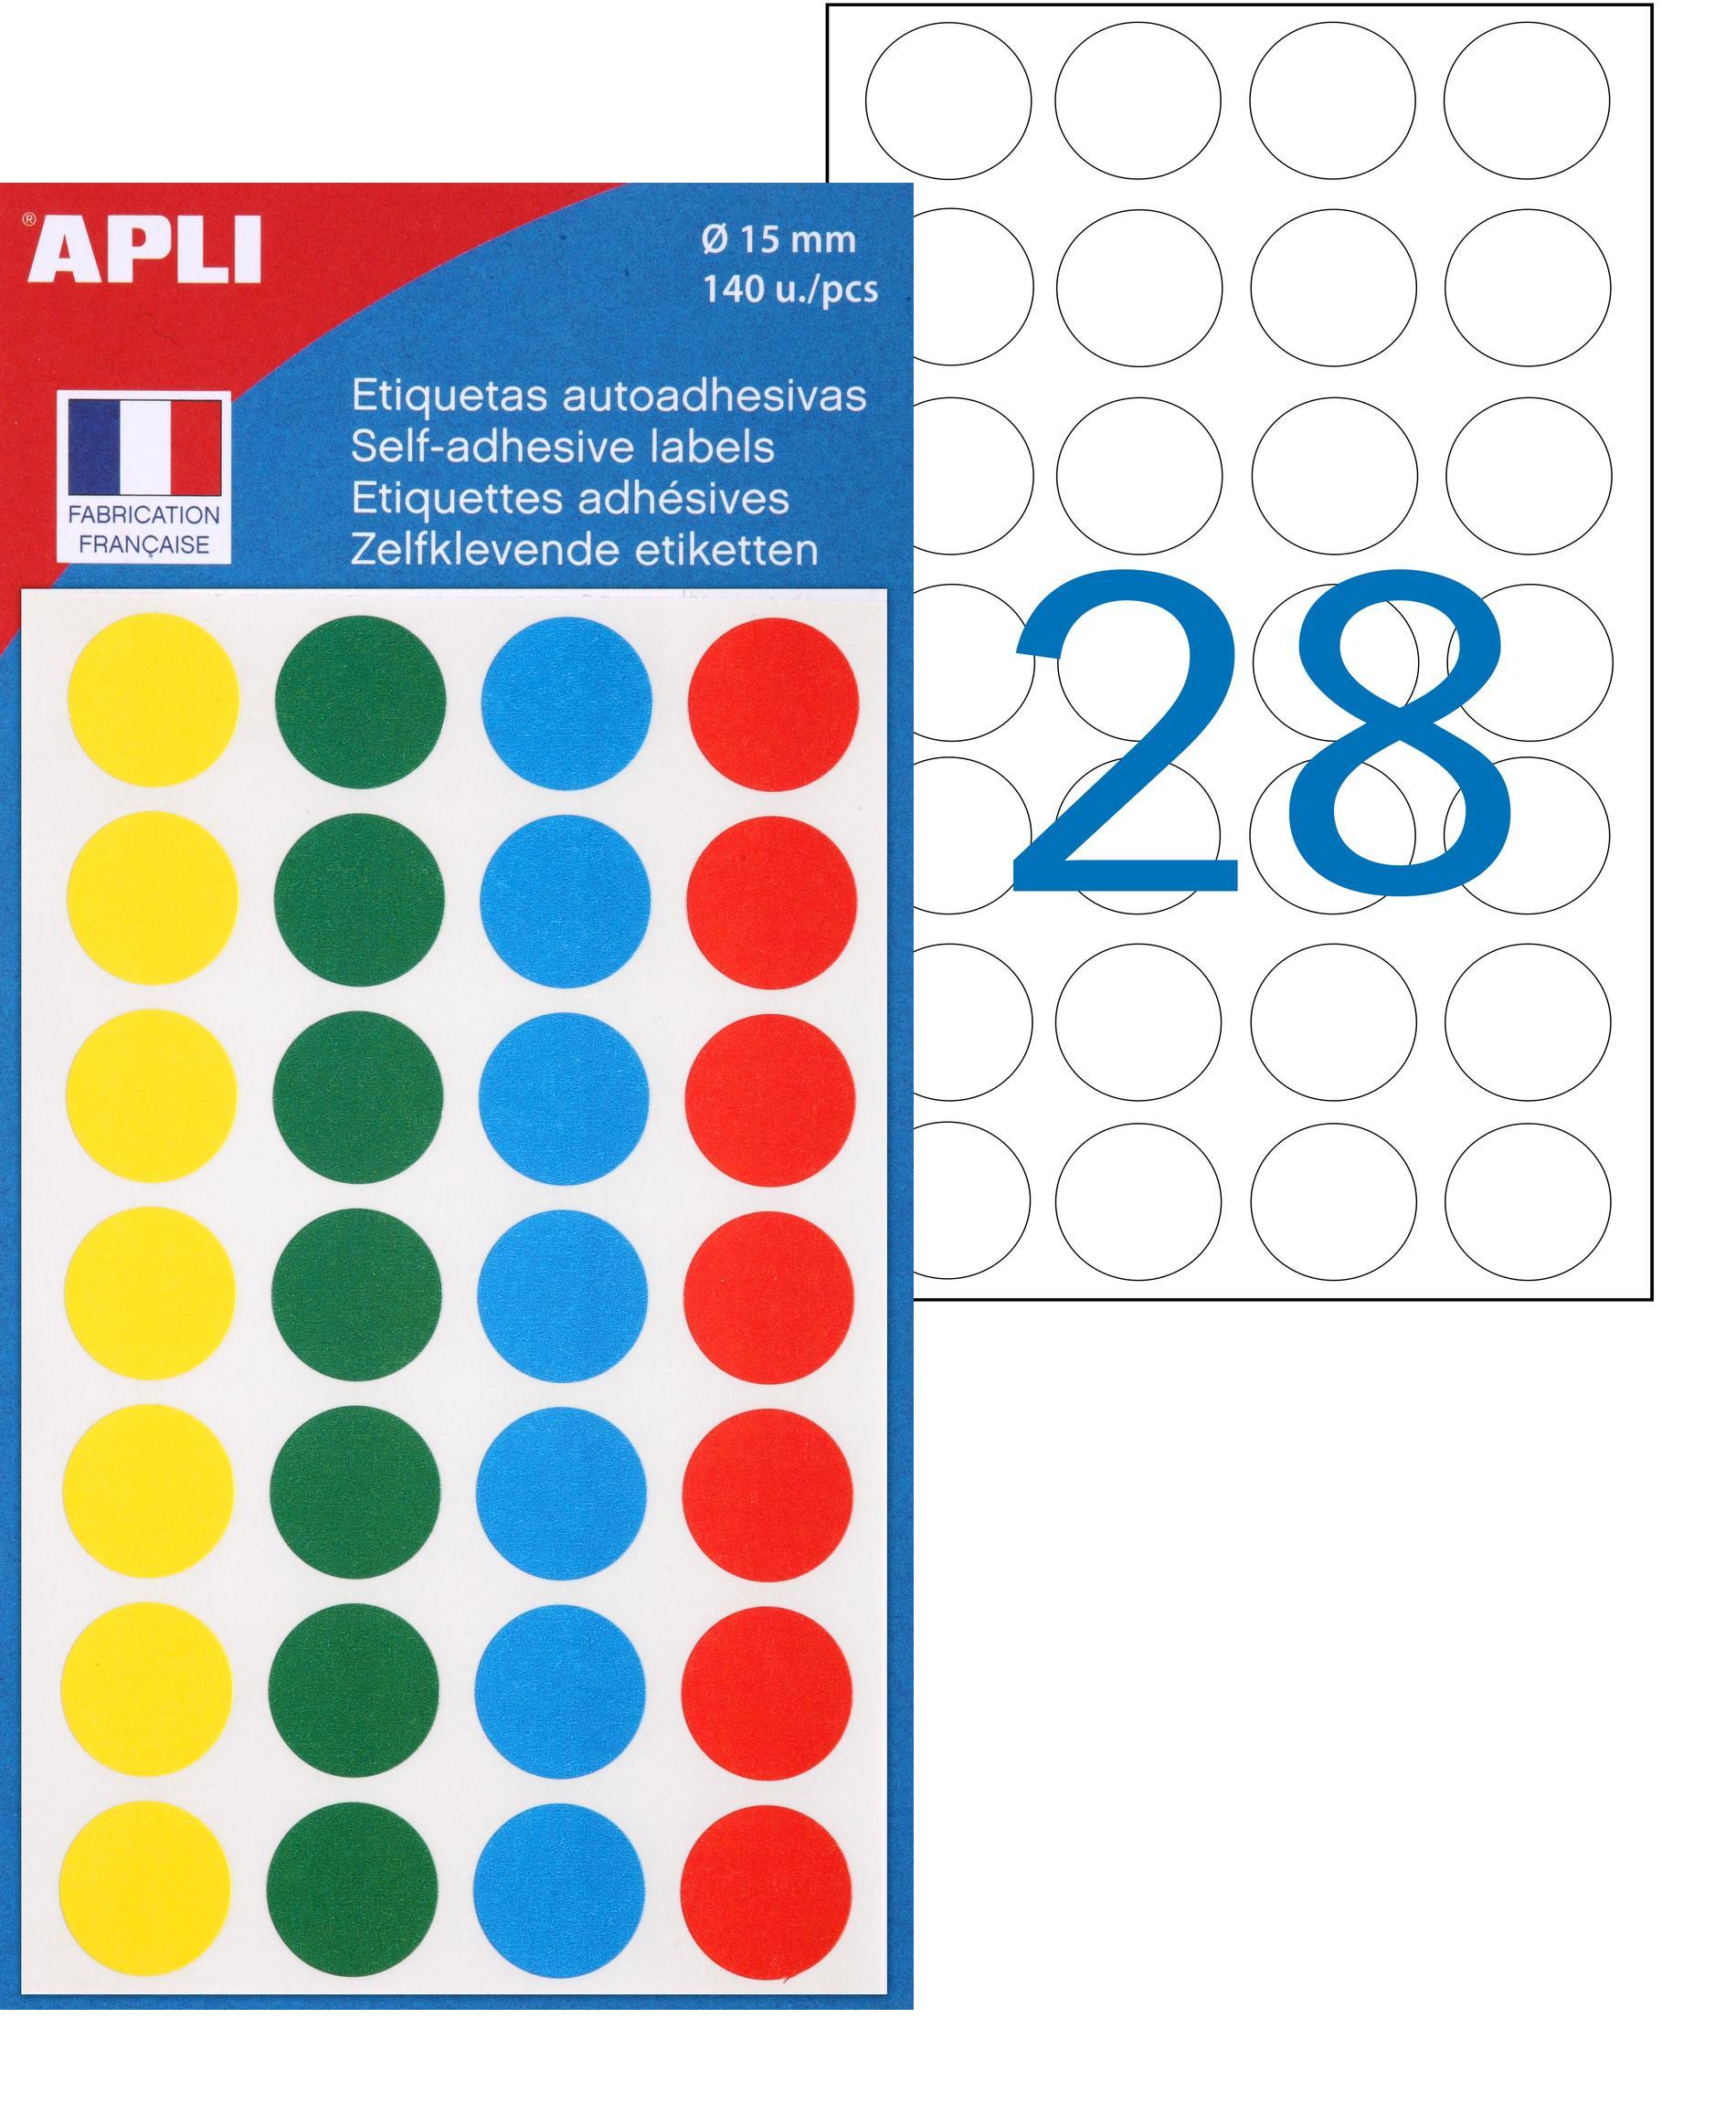 Apli Agipa - 140 Pastilles couleur assorties - diamètre 15 mm - réf 100625